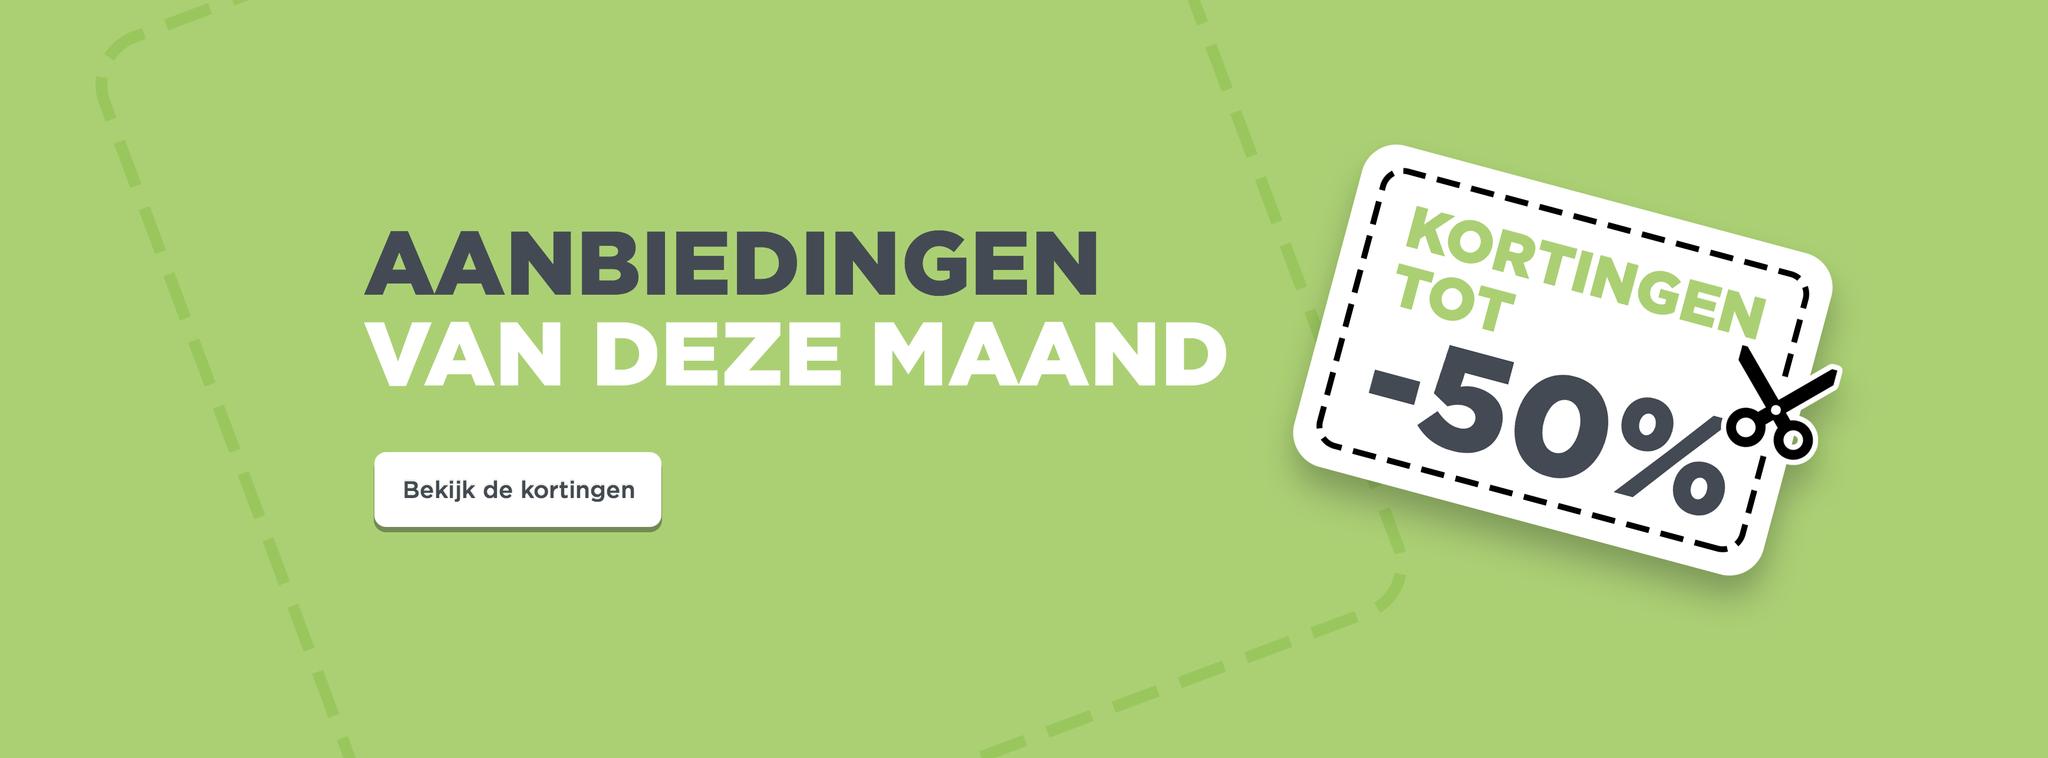 Degomeat Nederland vers vlees (kvv) voor hond & kat. banner 3